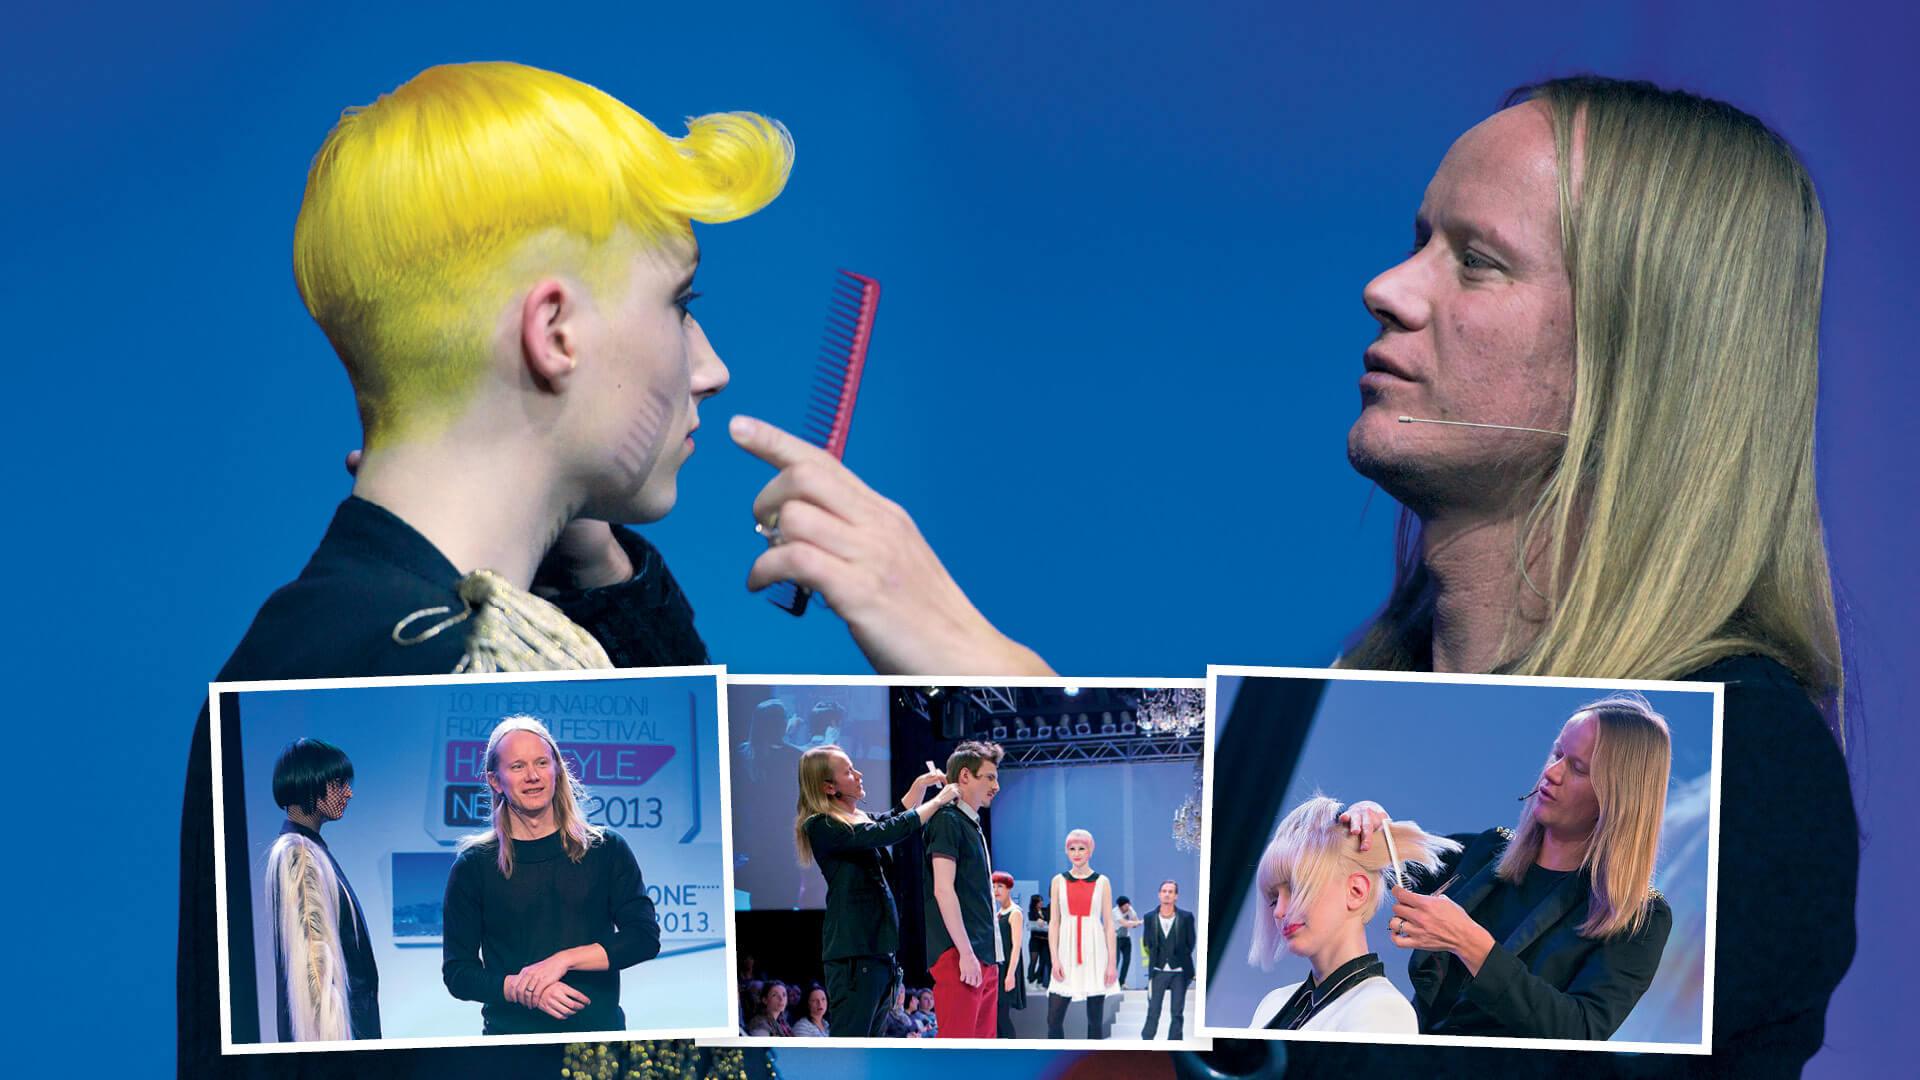 Tomaž Turk i kolaž fotografija nastupa njega i Mič Styling frizerske akademije na Hairstyle News frizerskom festivalu